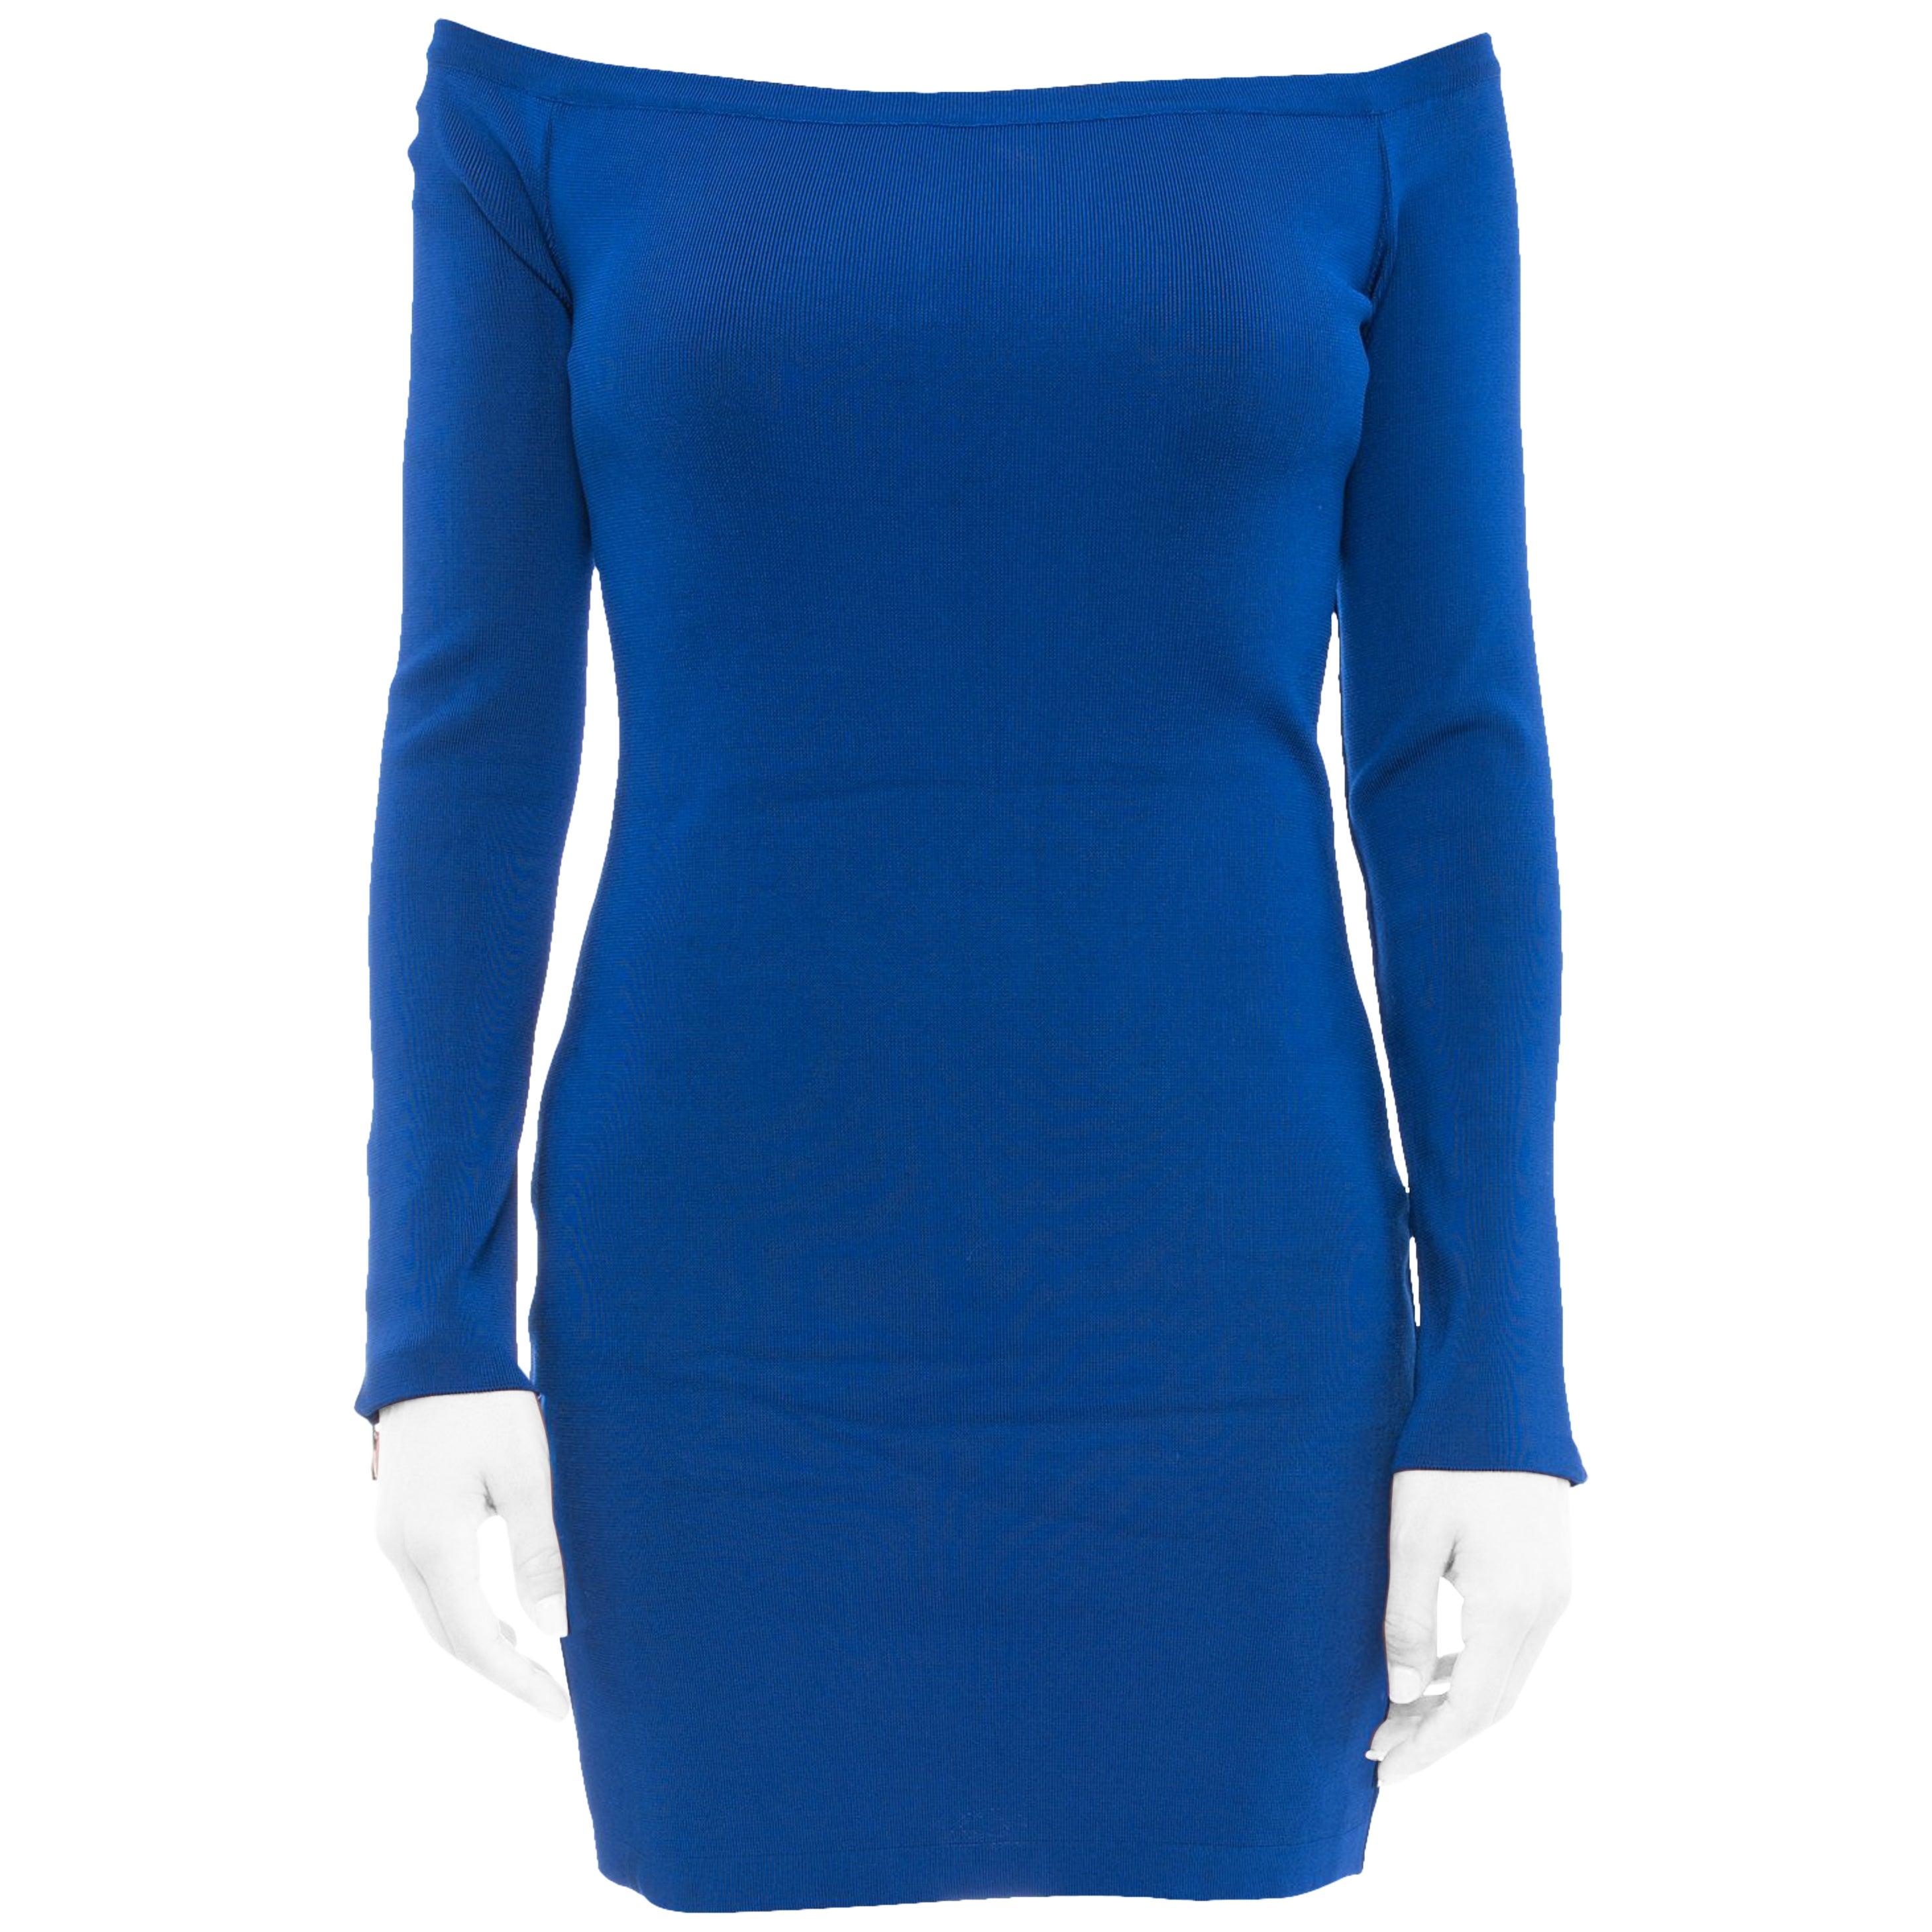 4a07c83f Balmain Cobalt Blue Off Shoulder Bodycon Dress at 1stdibs